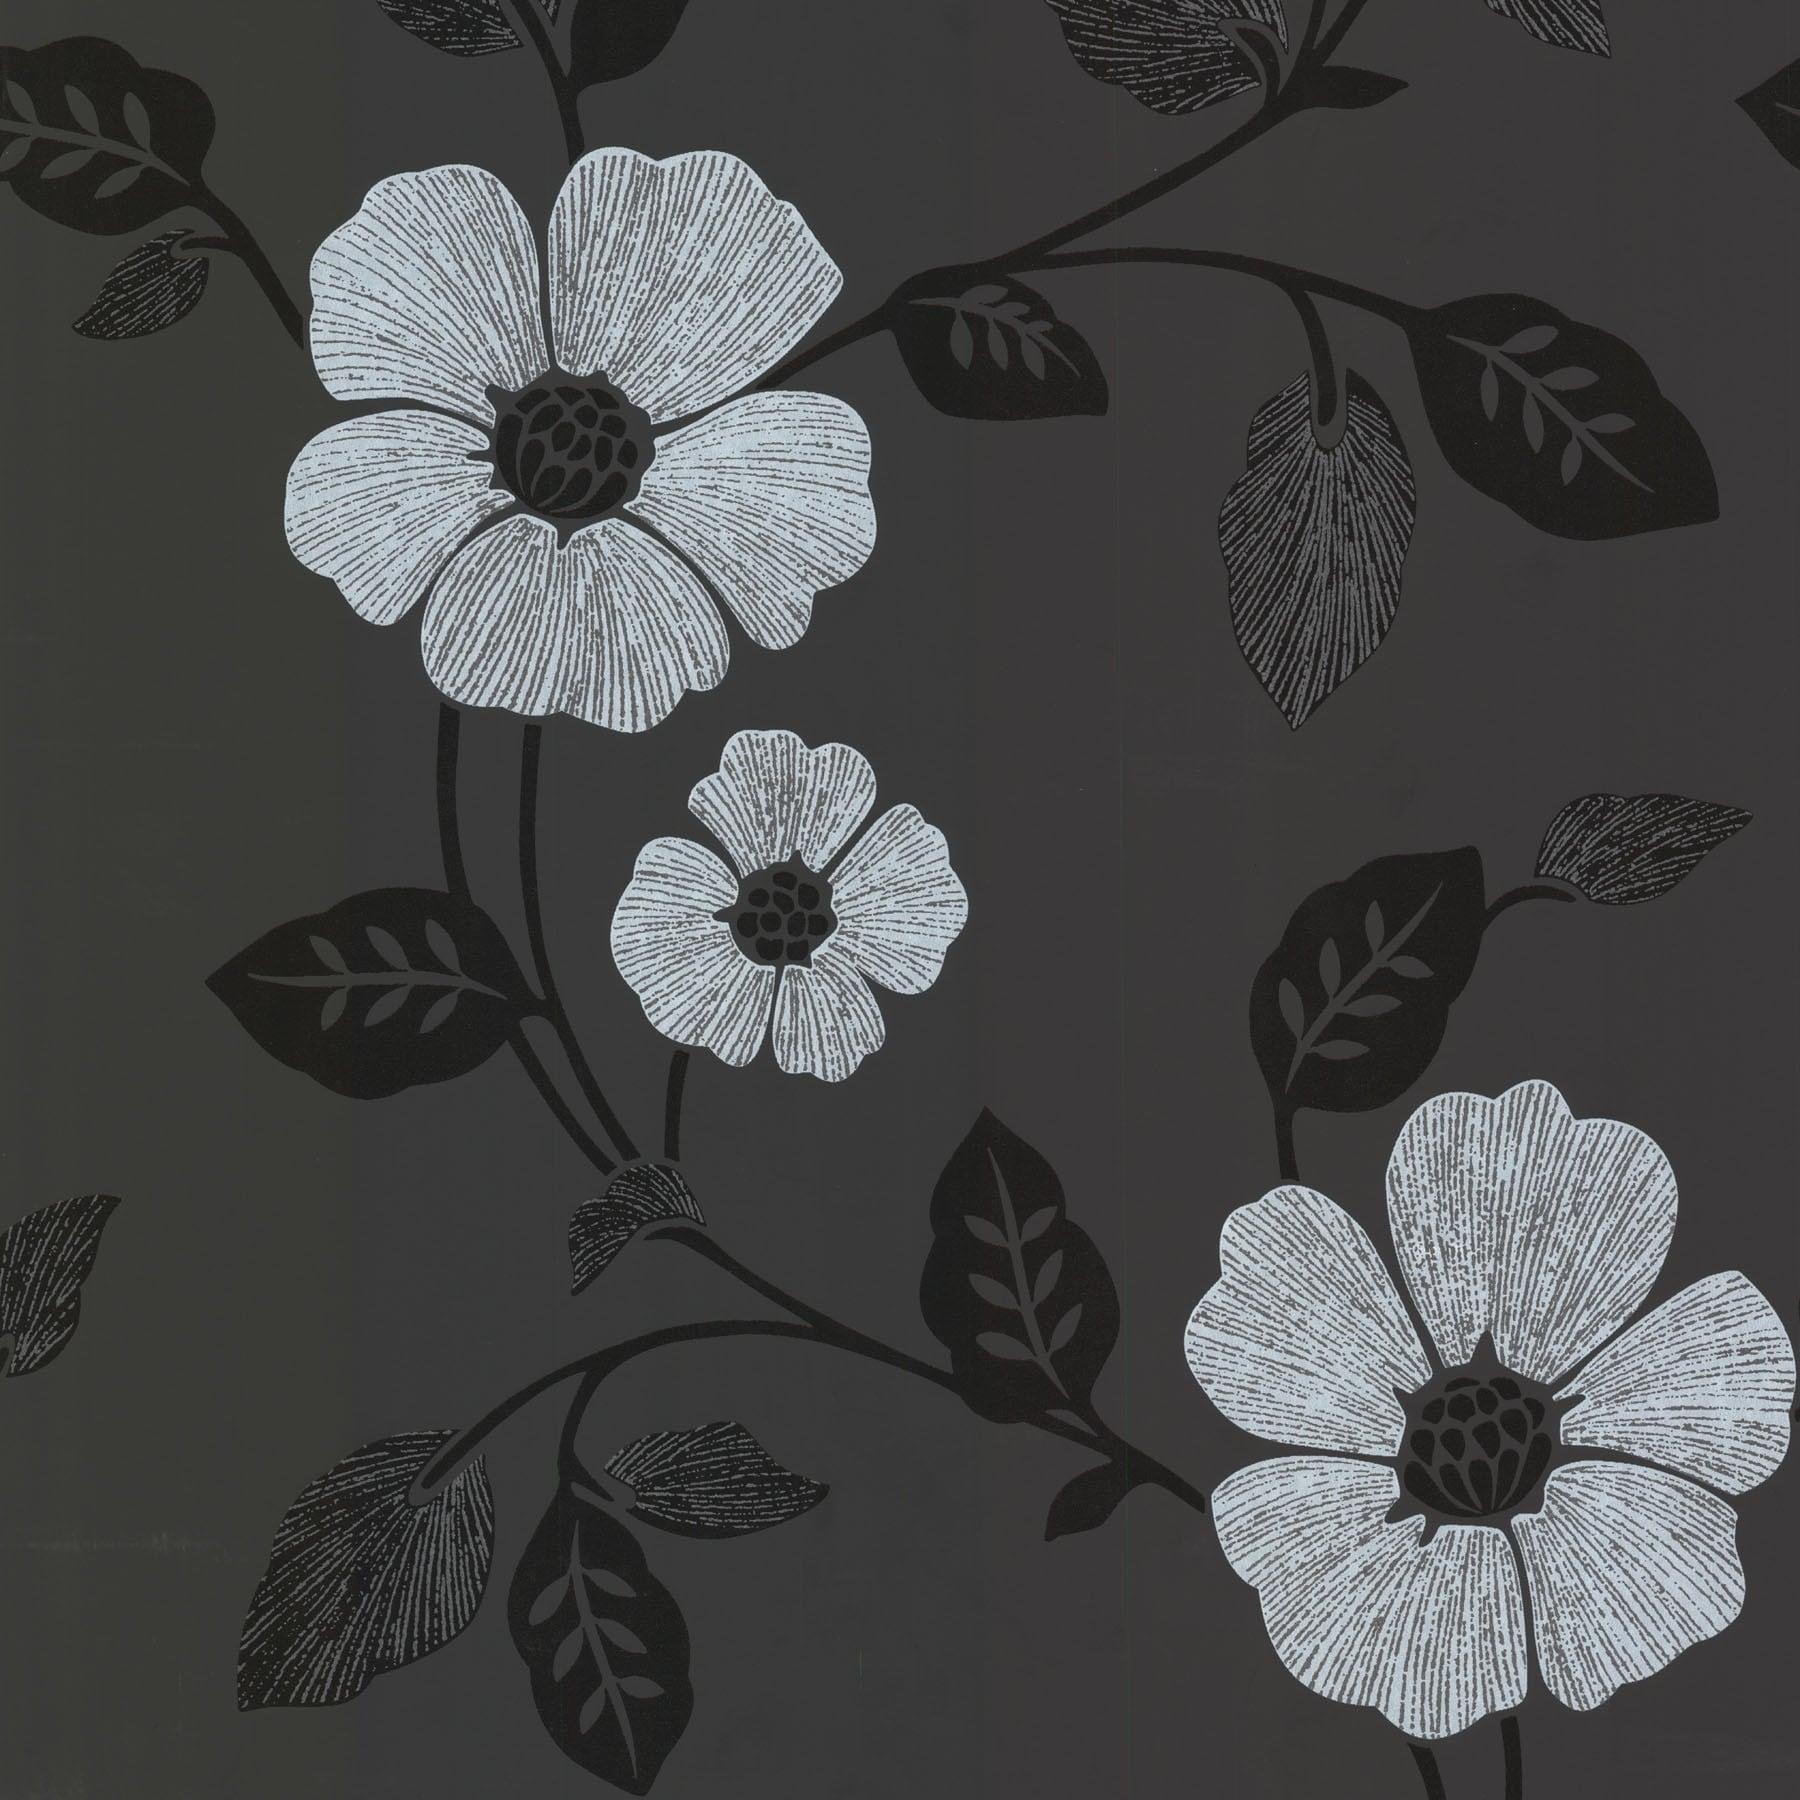 Shop Brewster 450 46962 Zync Black Modern Floral Wallpaper